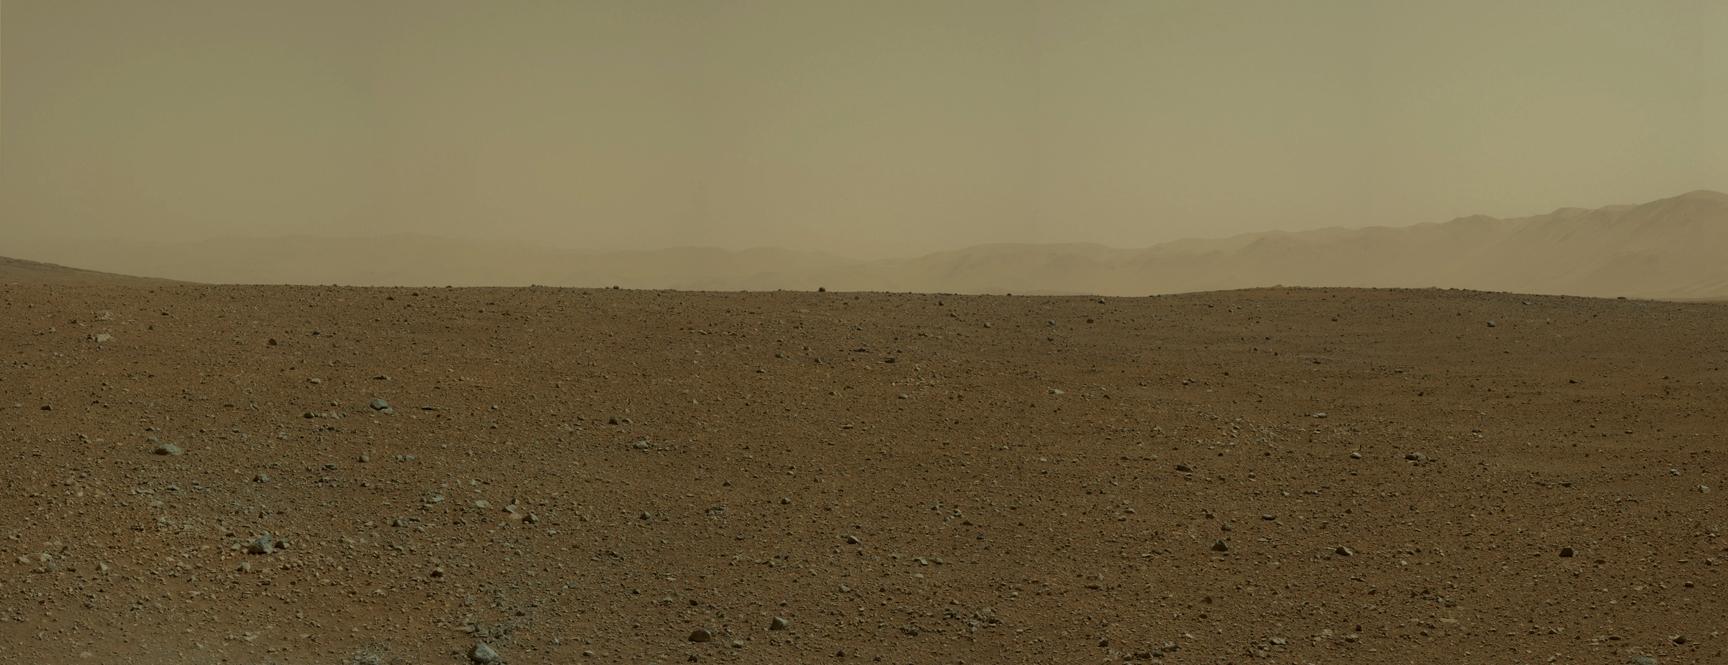 descriptions of a rover for mars - photo #17